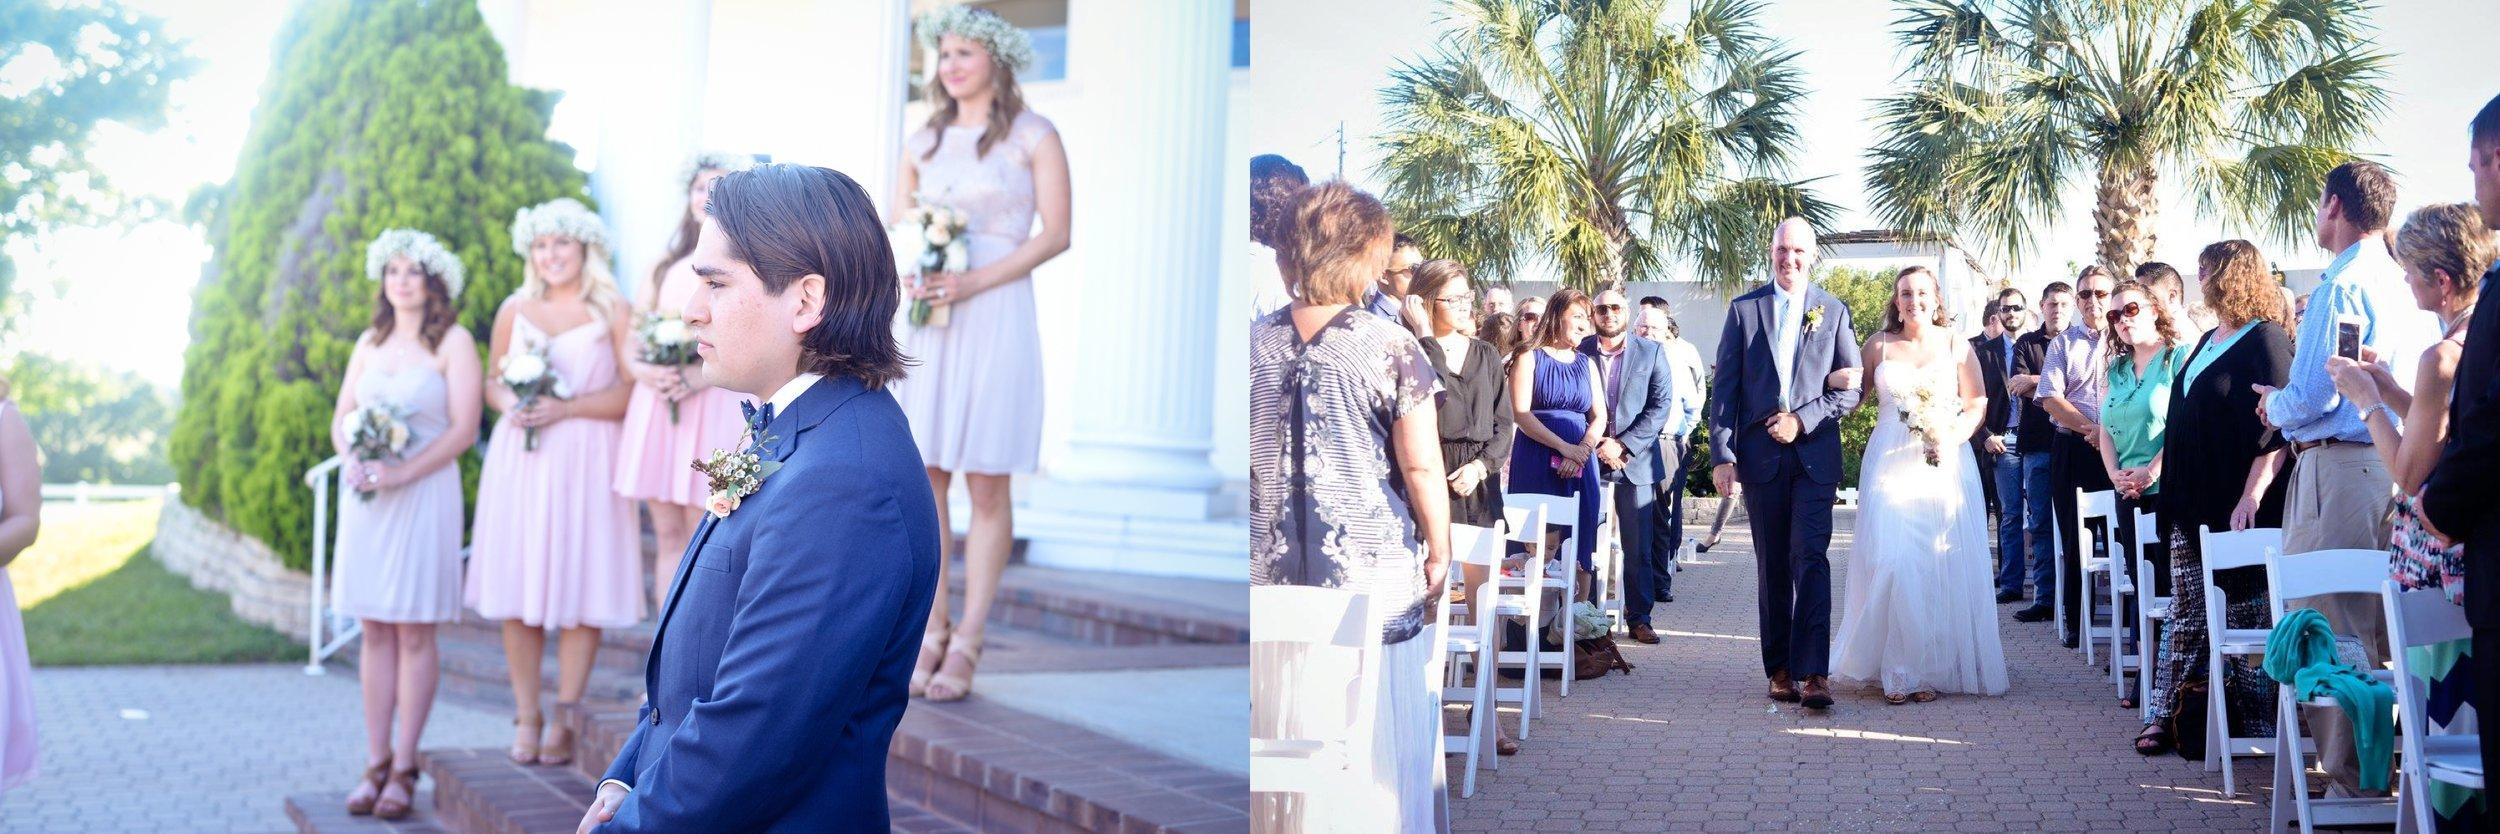 Lonestar-Mansion-Fort-Worth-Wedding-Planner-Burleson-Wedding-Venue_28.jpg